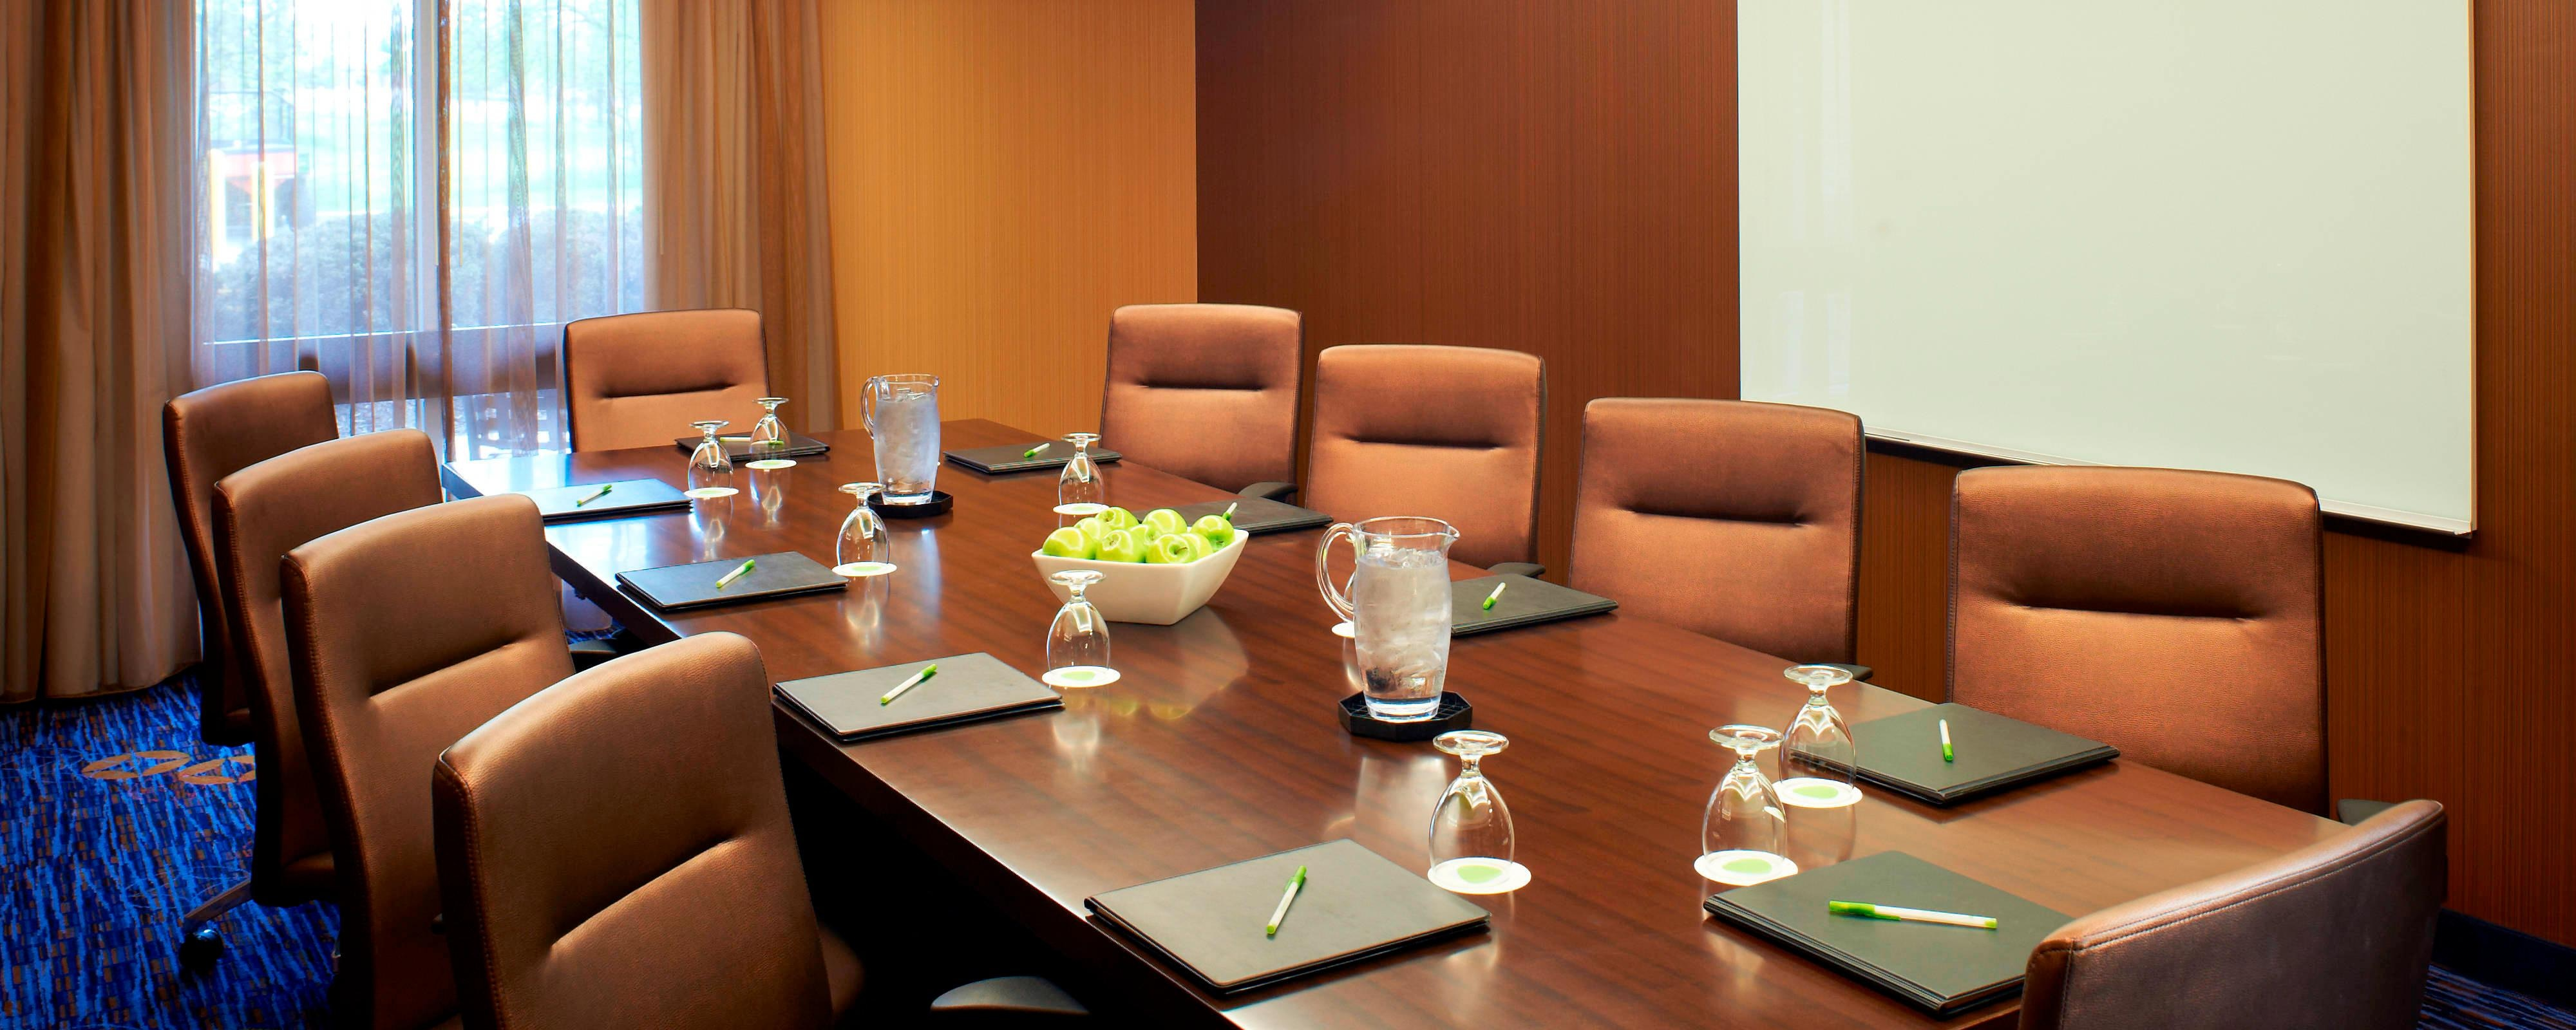 Hotel Event Meeting Venues